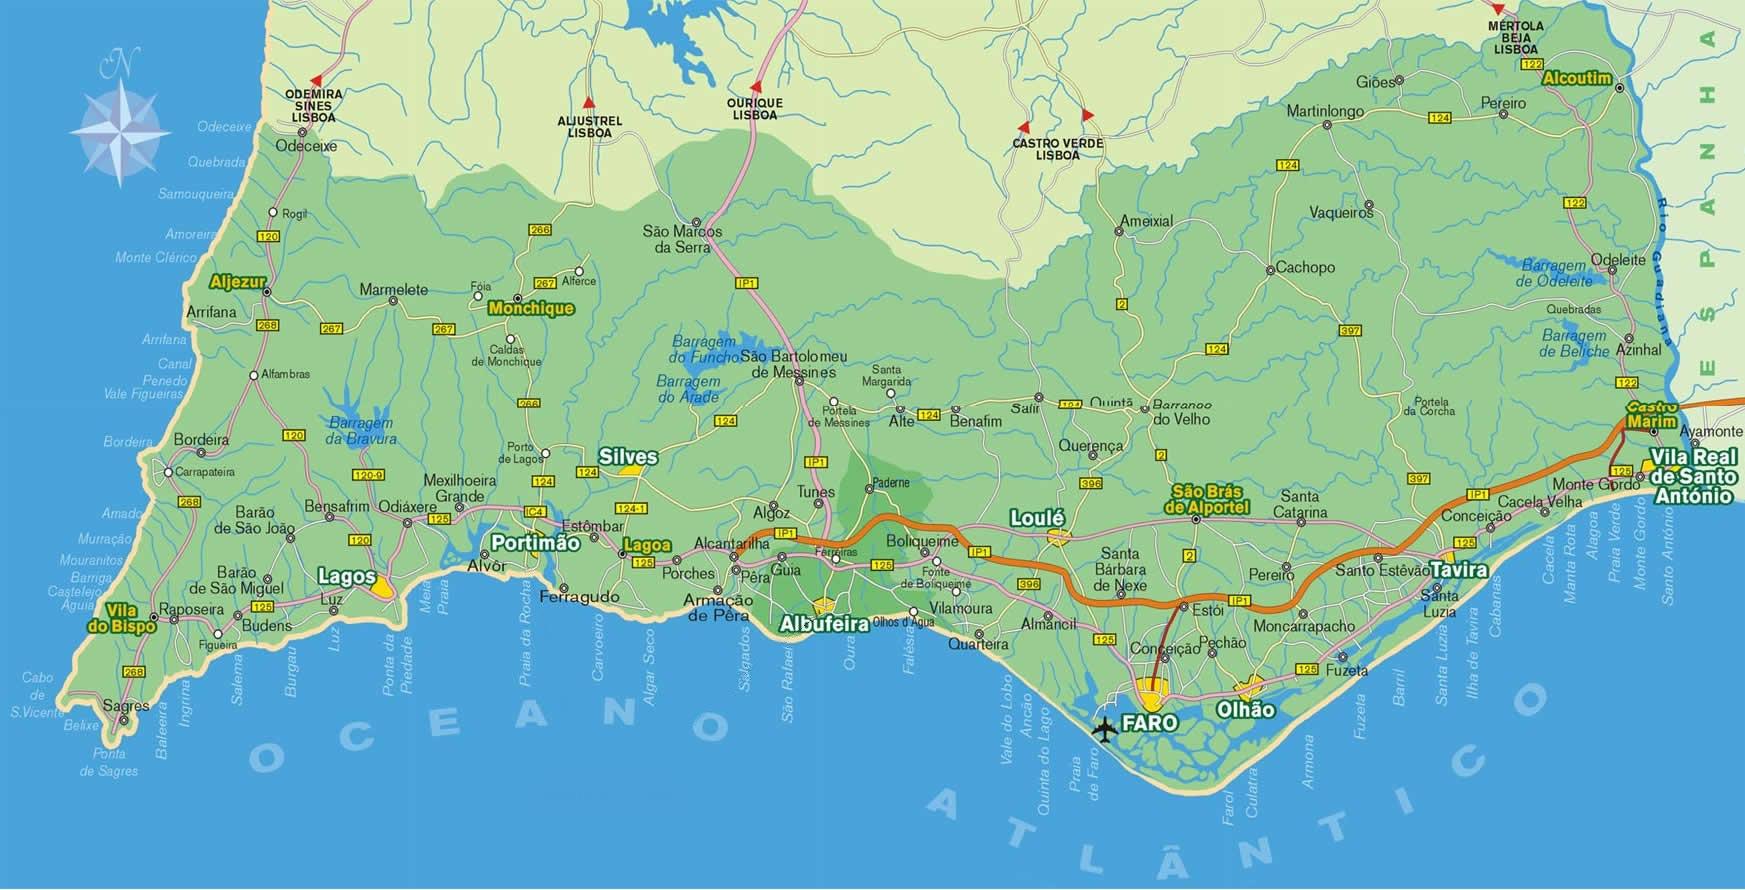 Algarve Maps Portugal Neils Travel Web - Portugal map west coast